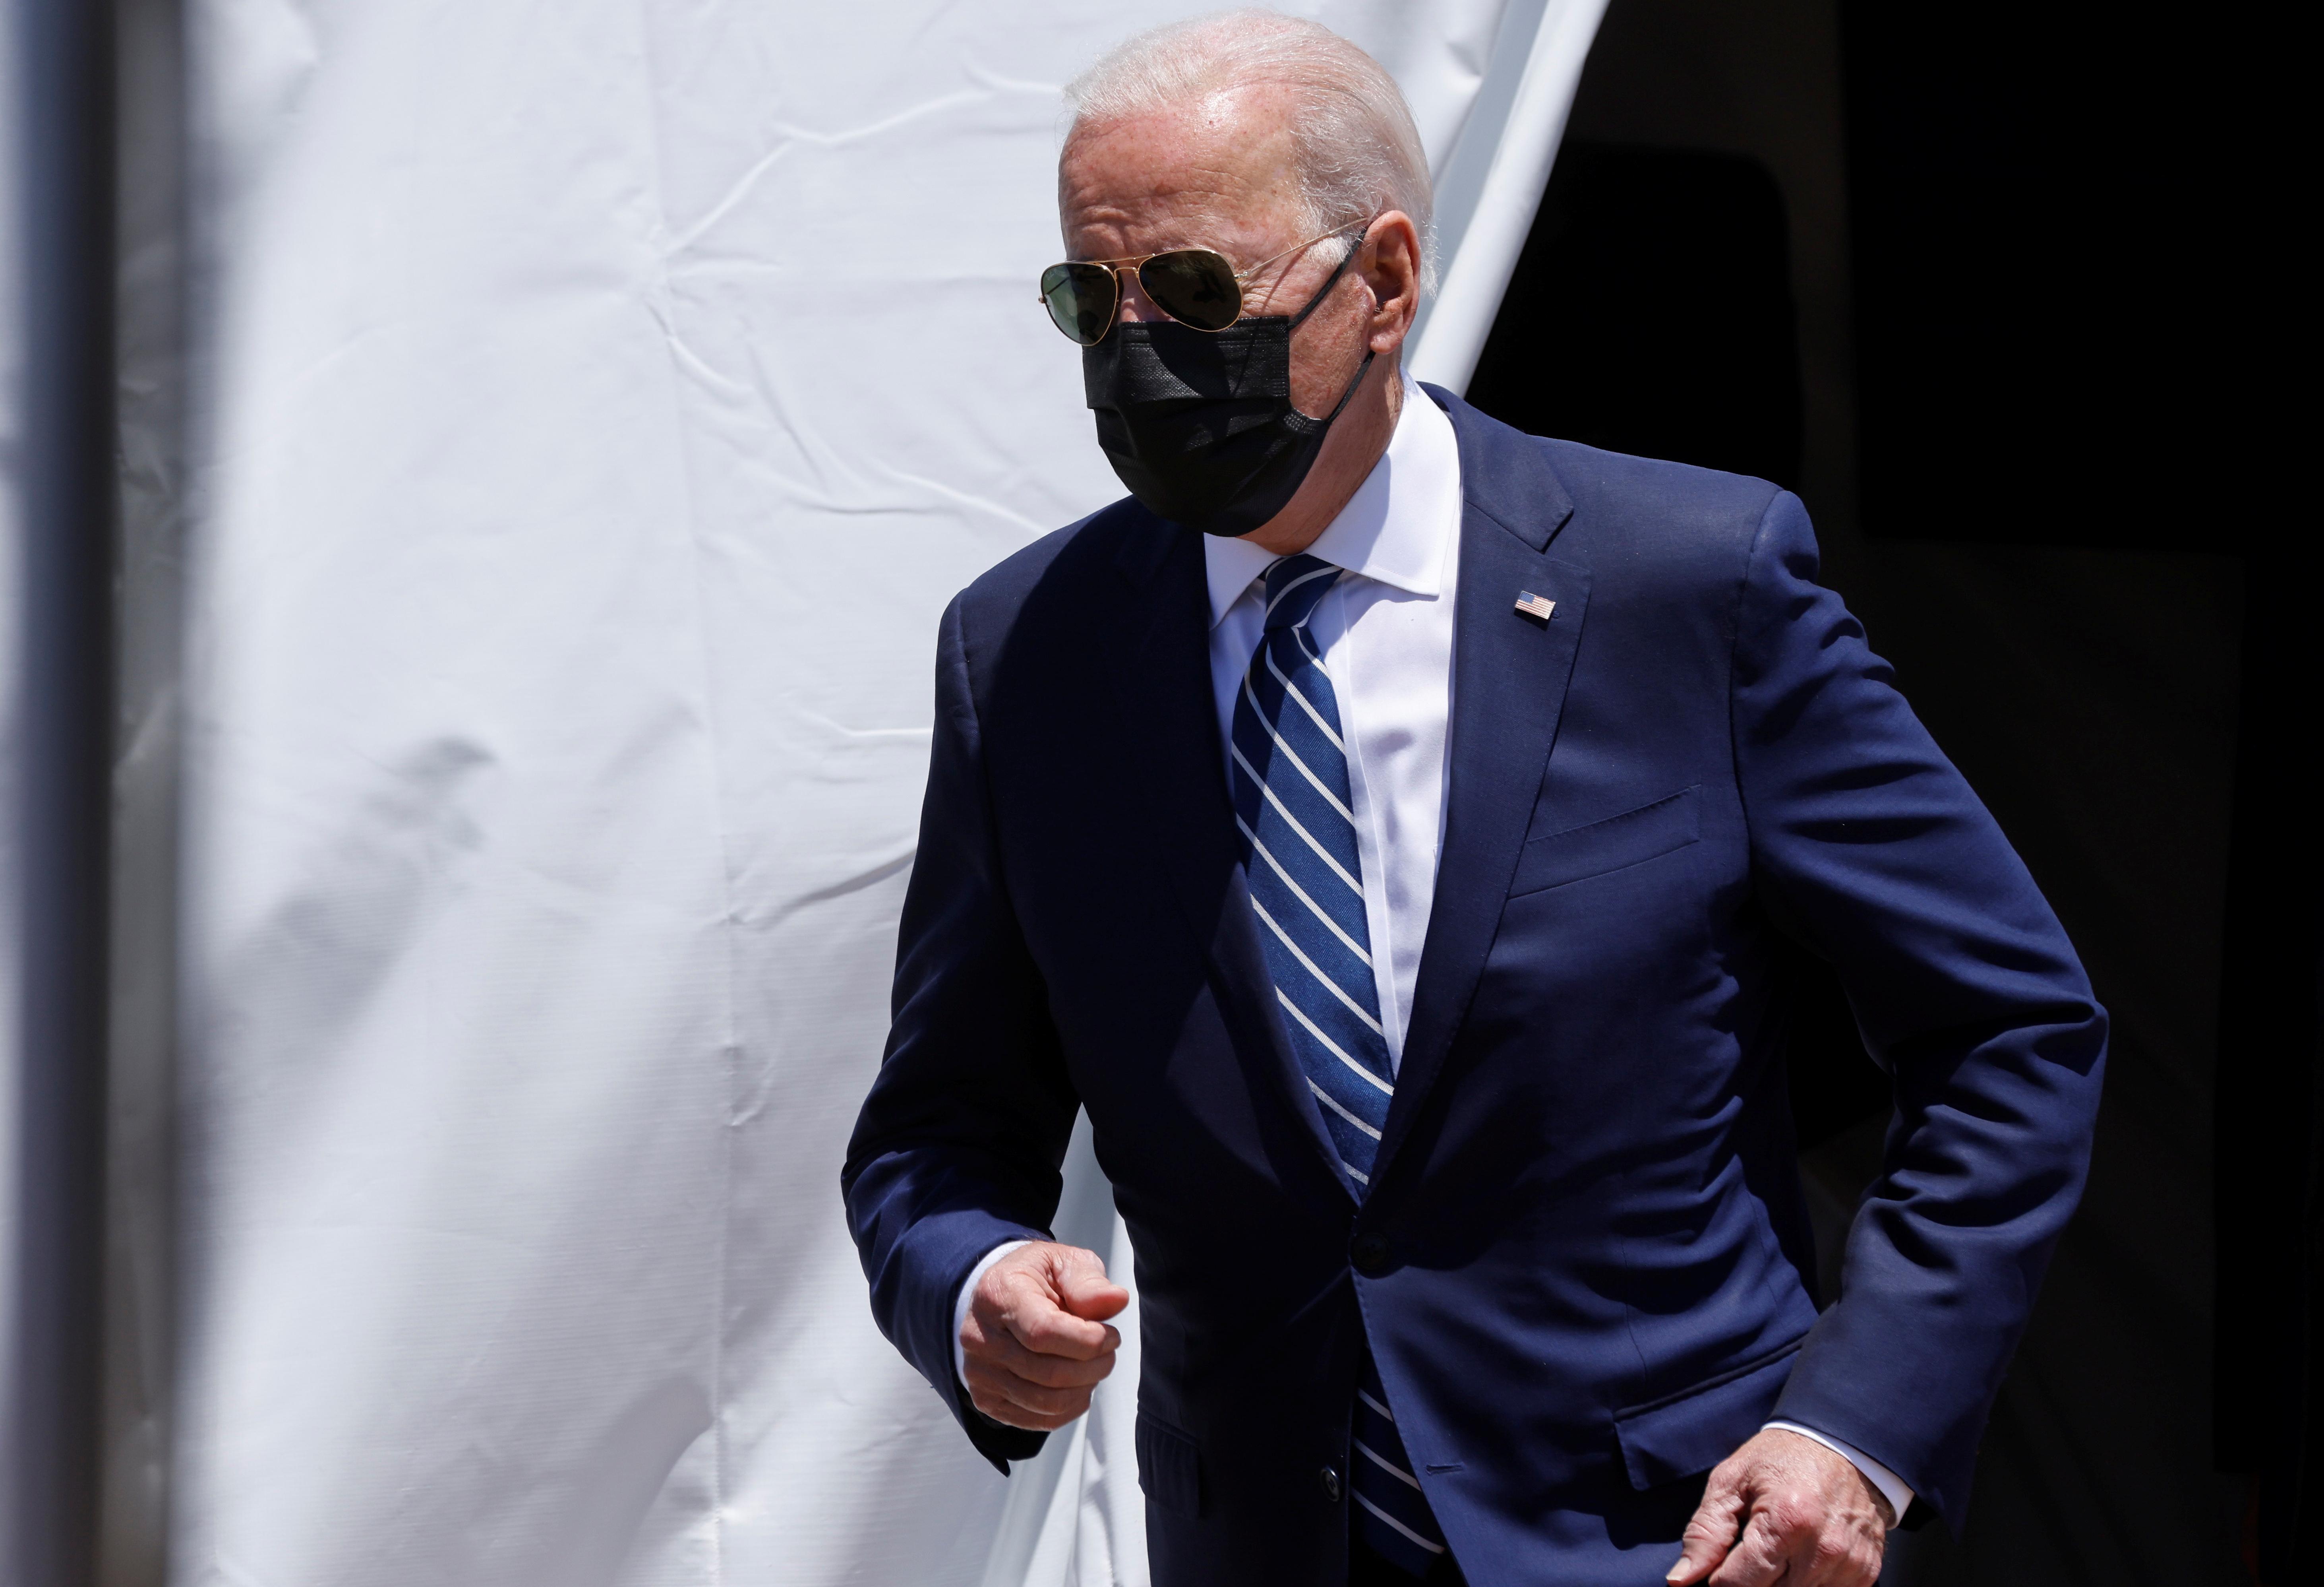 U.S. President Joe Biden arrives to deliver remarks on his American Jobs Plan near the Calcasieu River Bridge in Lake Charles, Louisiana, U.S., May 6, 2021.  REUTERS/Jonathan Ernst